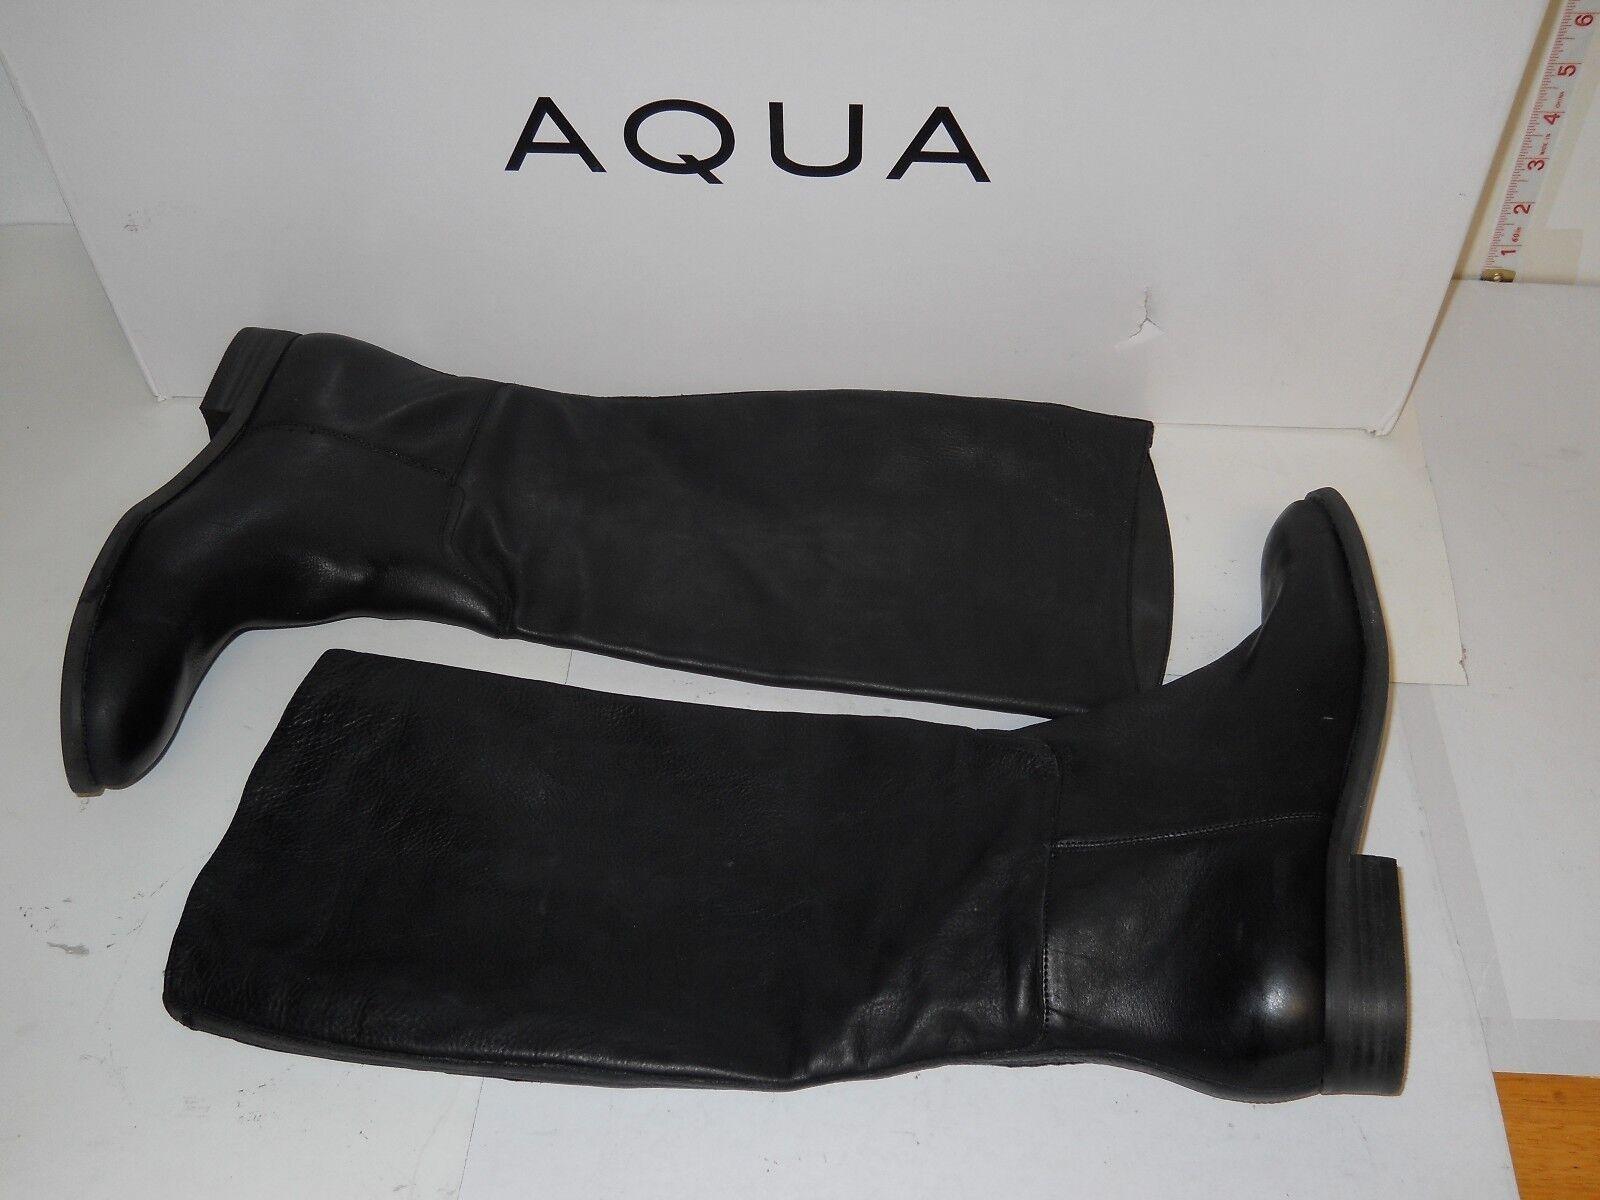 Aqua New Womens Rider Black Leather Boots 6 M Shoes NWB